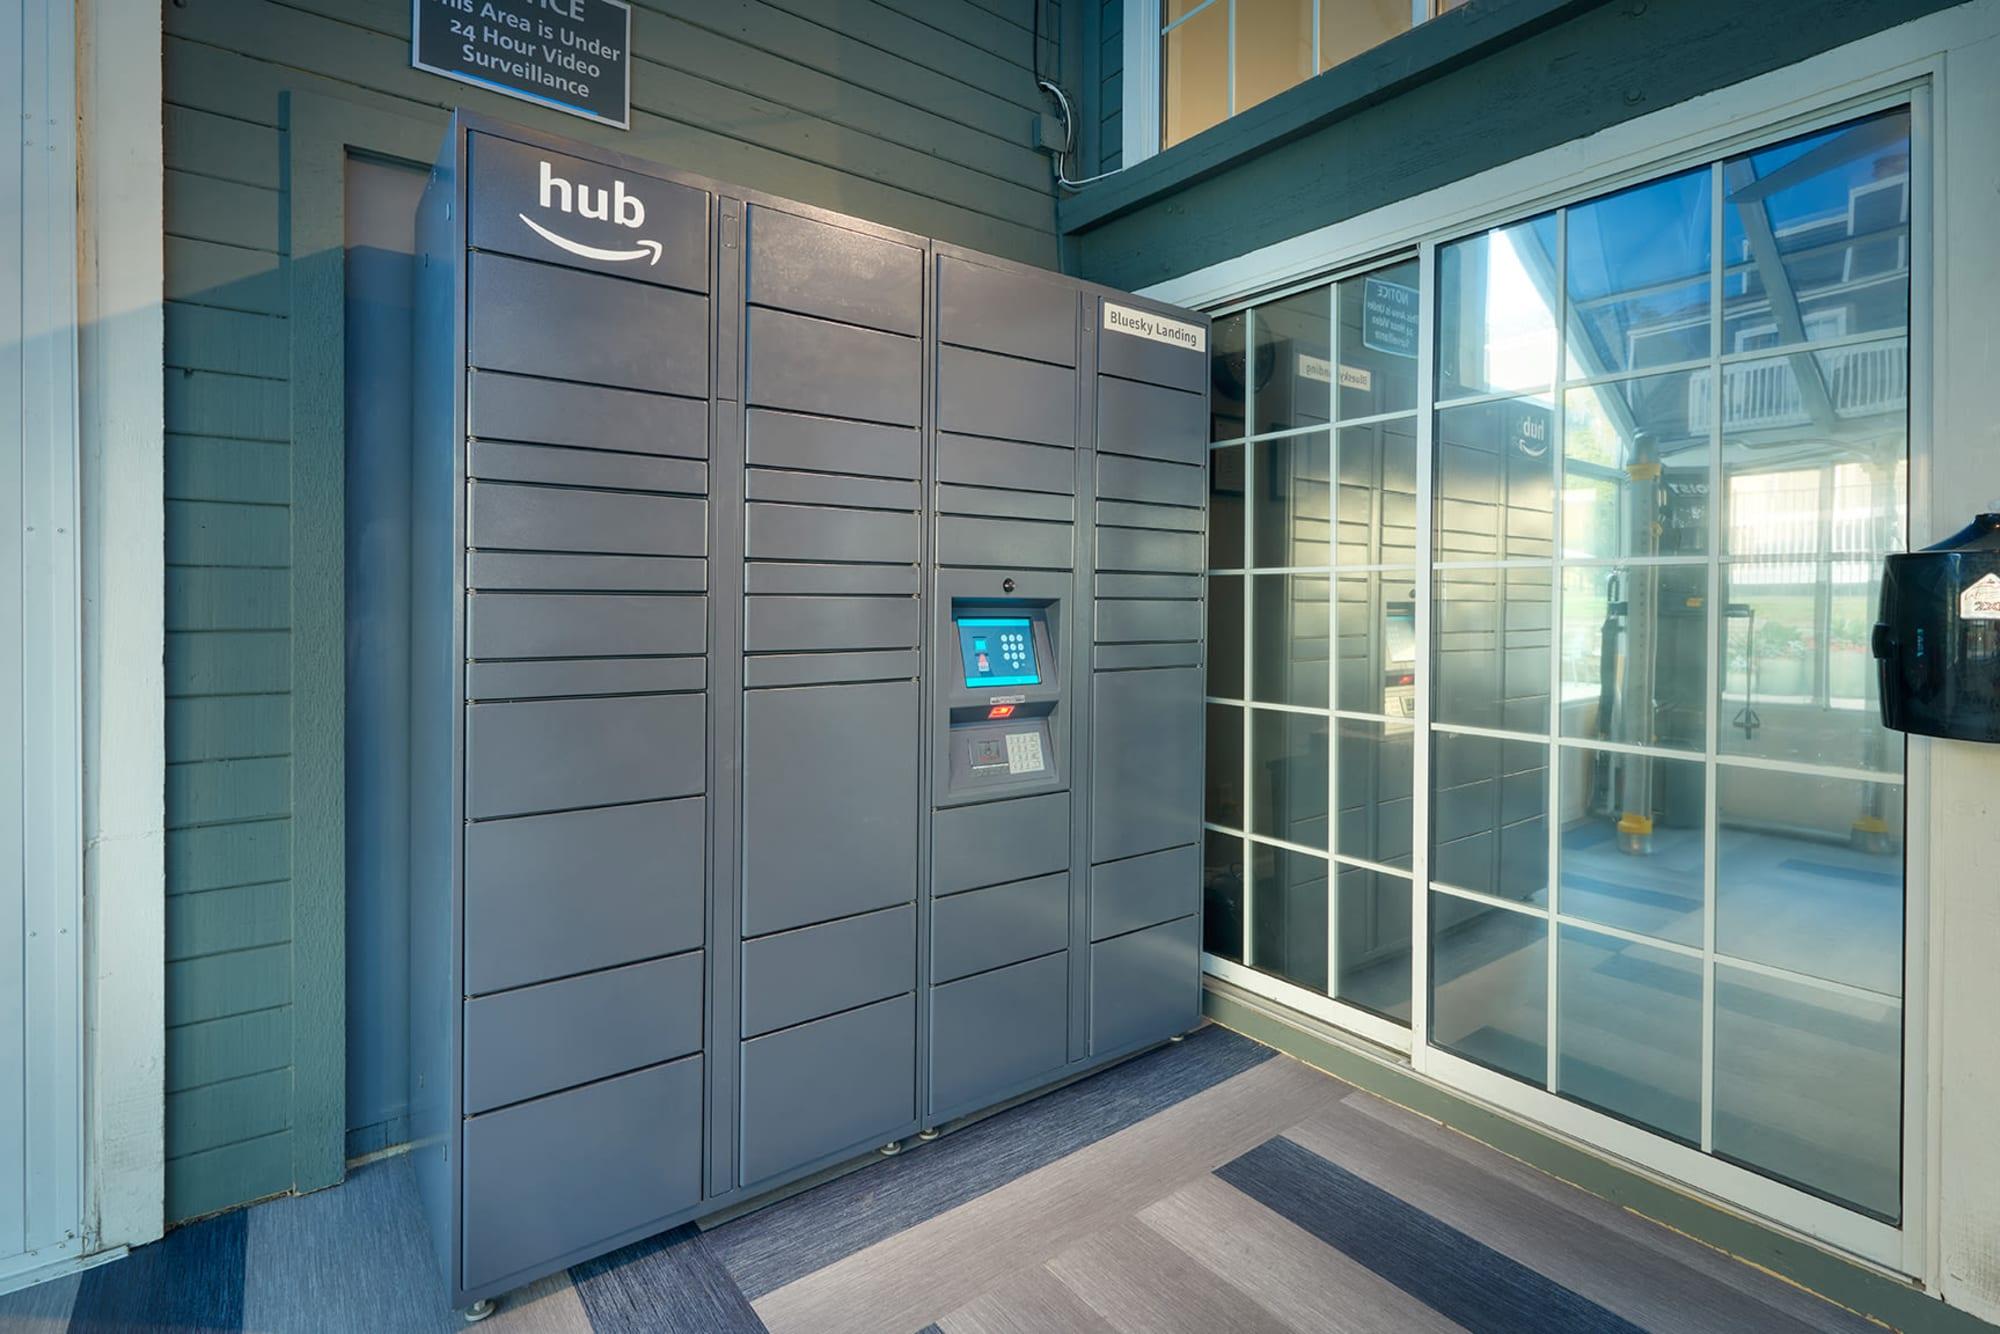 The Amazon HUB package lockers at Bluesky Landing Apartments in Lakewood, Colorado